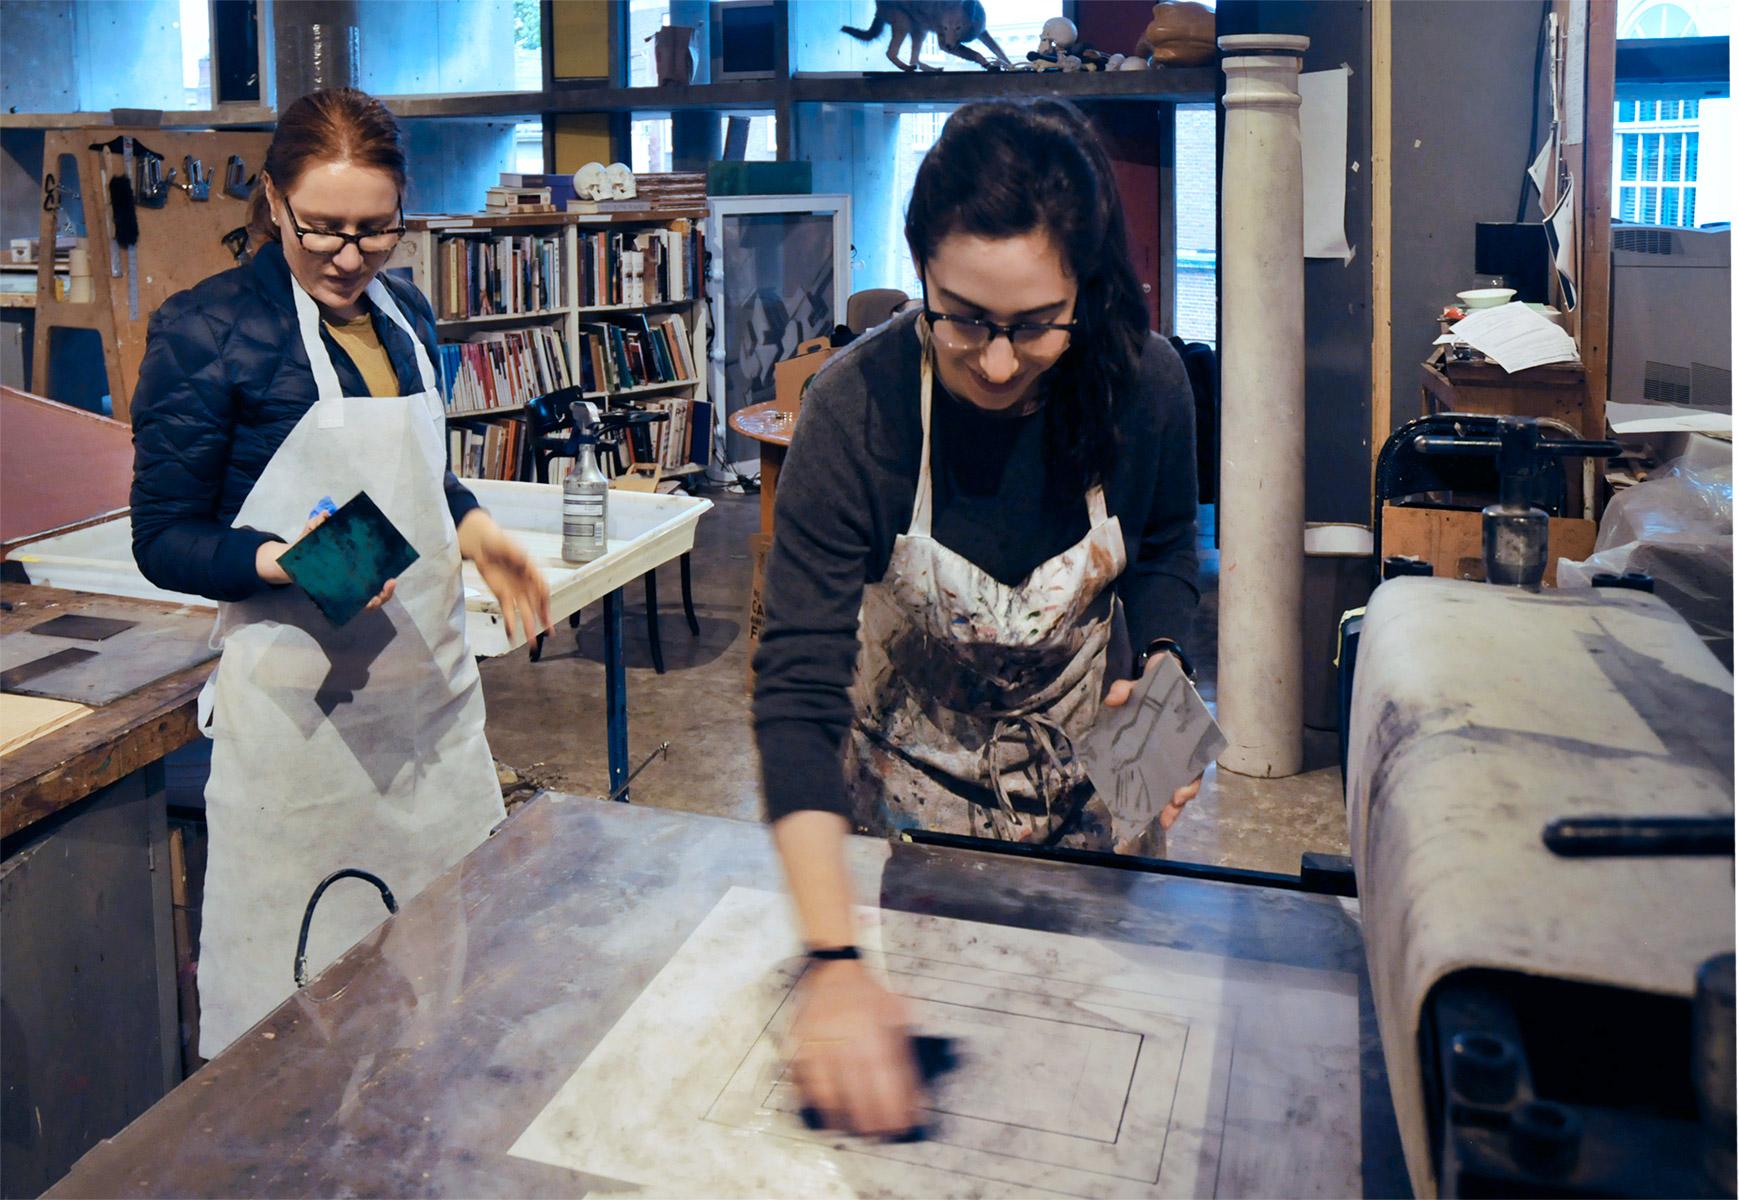 Kathryn Kremnitzer and Michal Goldschmidt prepare to print their etchings during Matt Saunders's printmaking session.